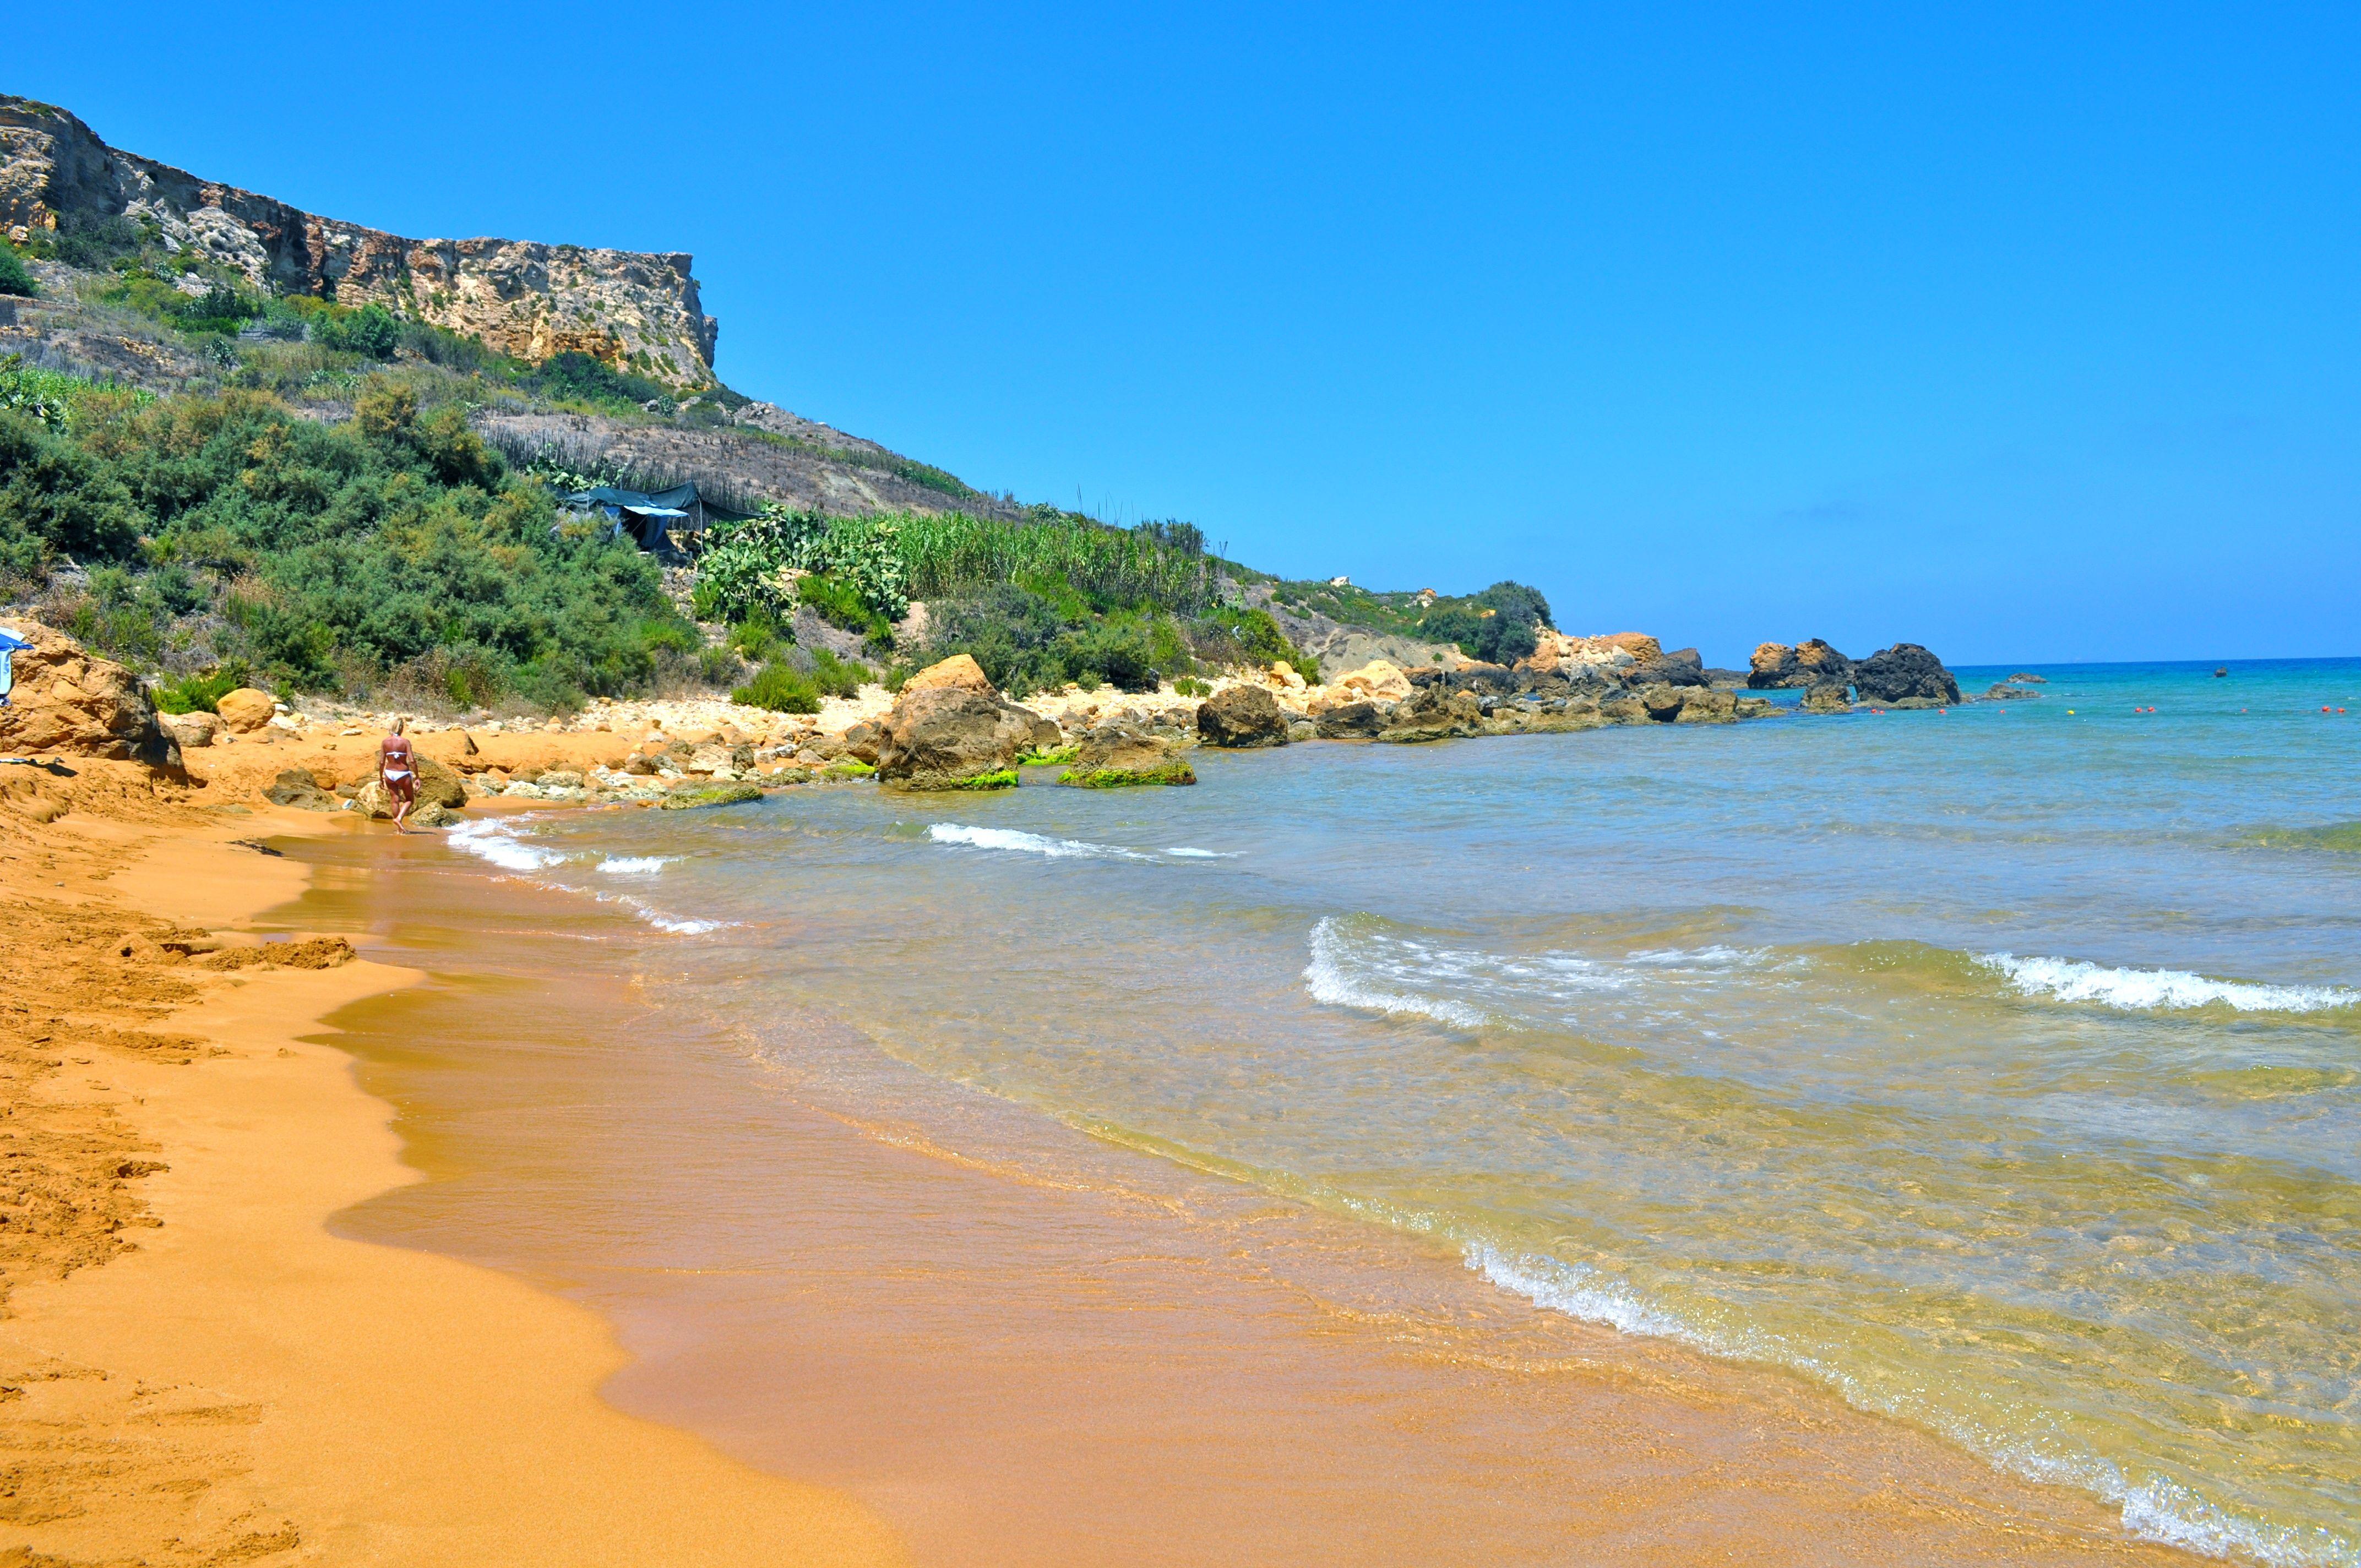 My favorite beach on the Island. San Blas Beach,Nadur